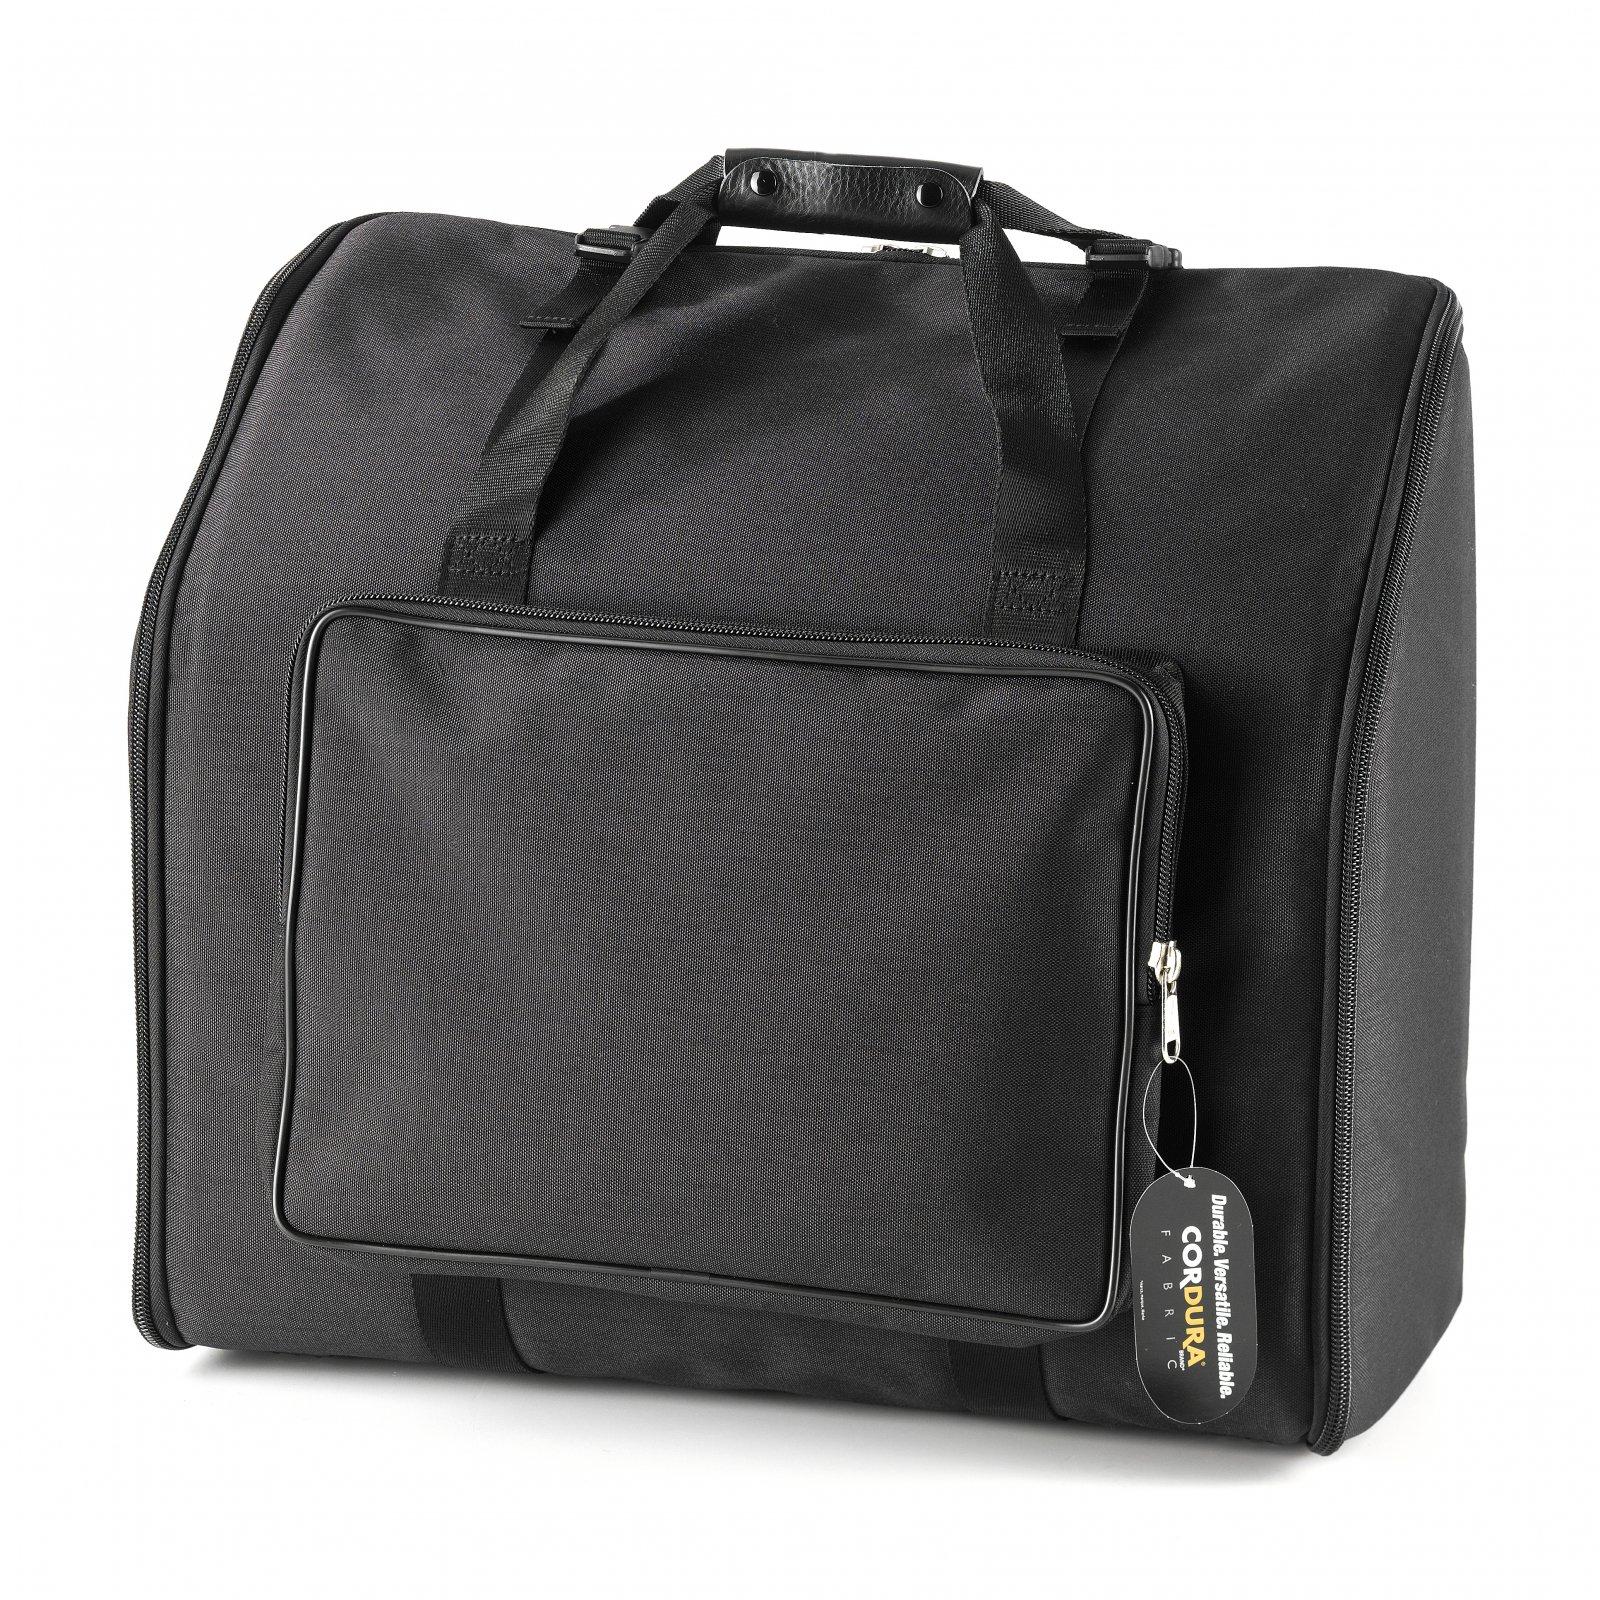 NEW Black Fuselli Gig Bag for Chromatic Button Accordion 19.5' x 16.5 x 10